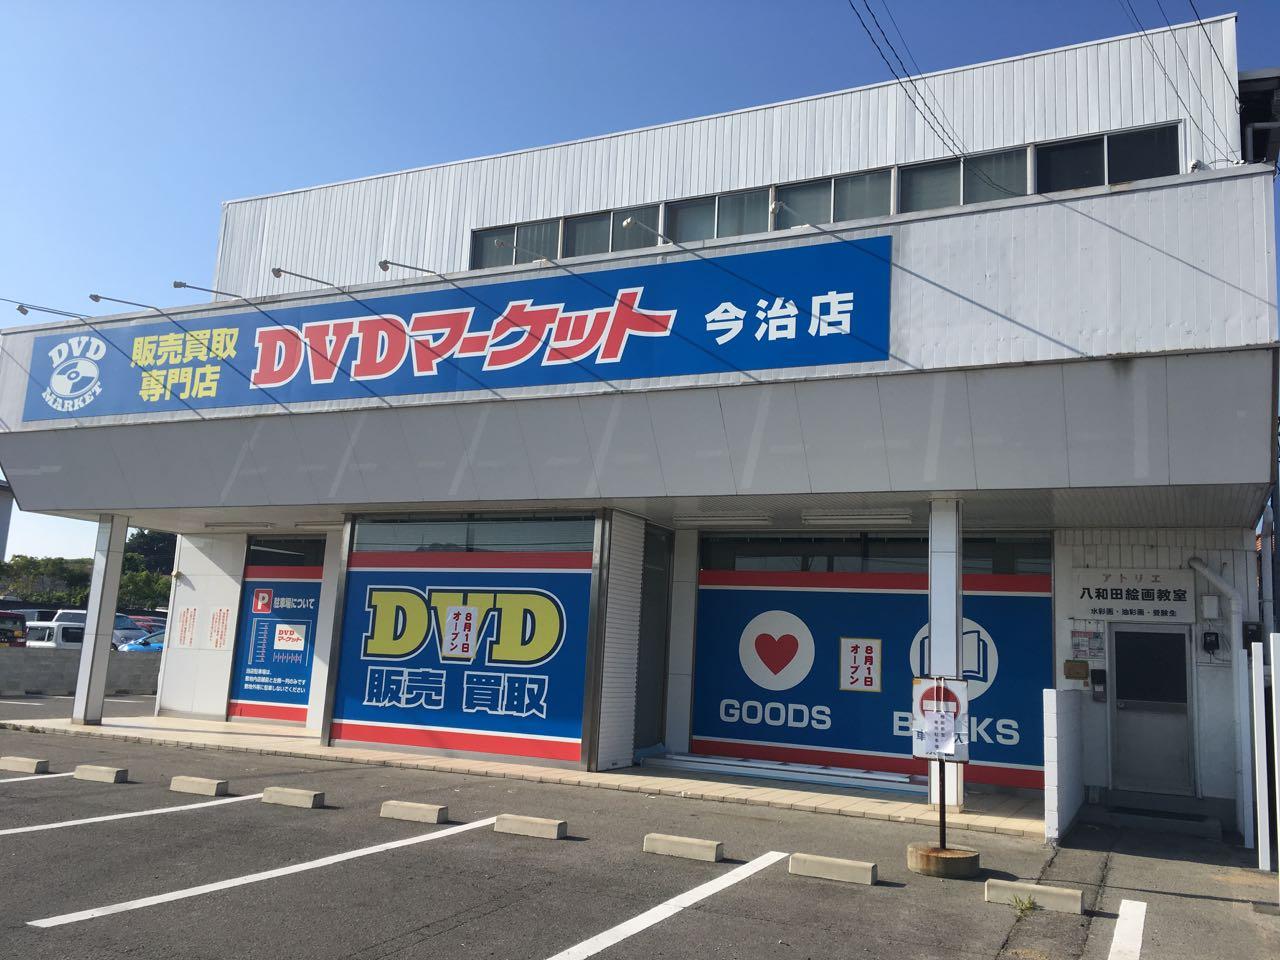 DVDマーケット,ehime,imabari,みとん今治,今治,愛媛,阿方